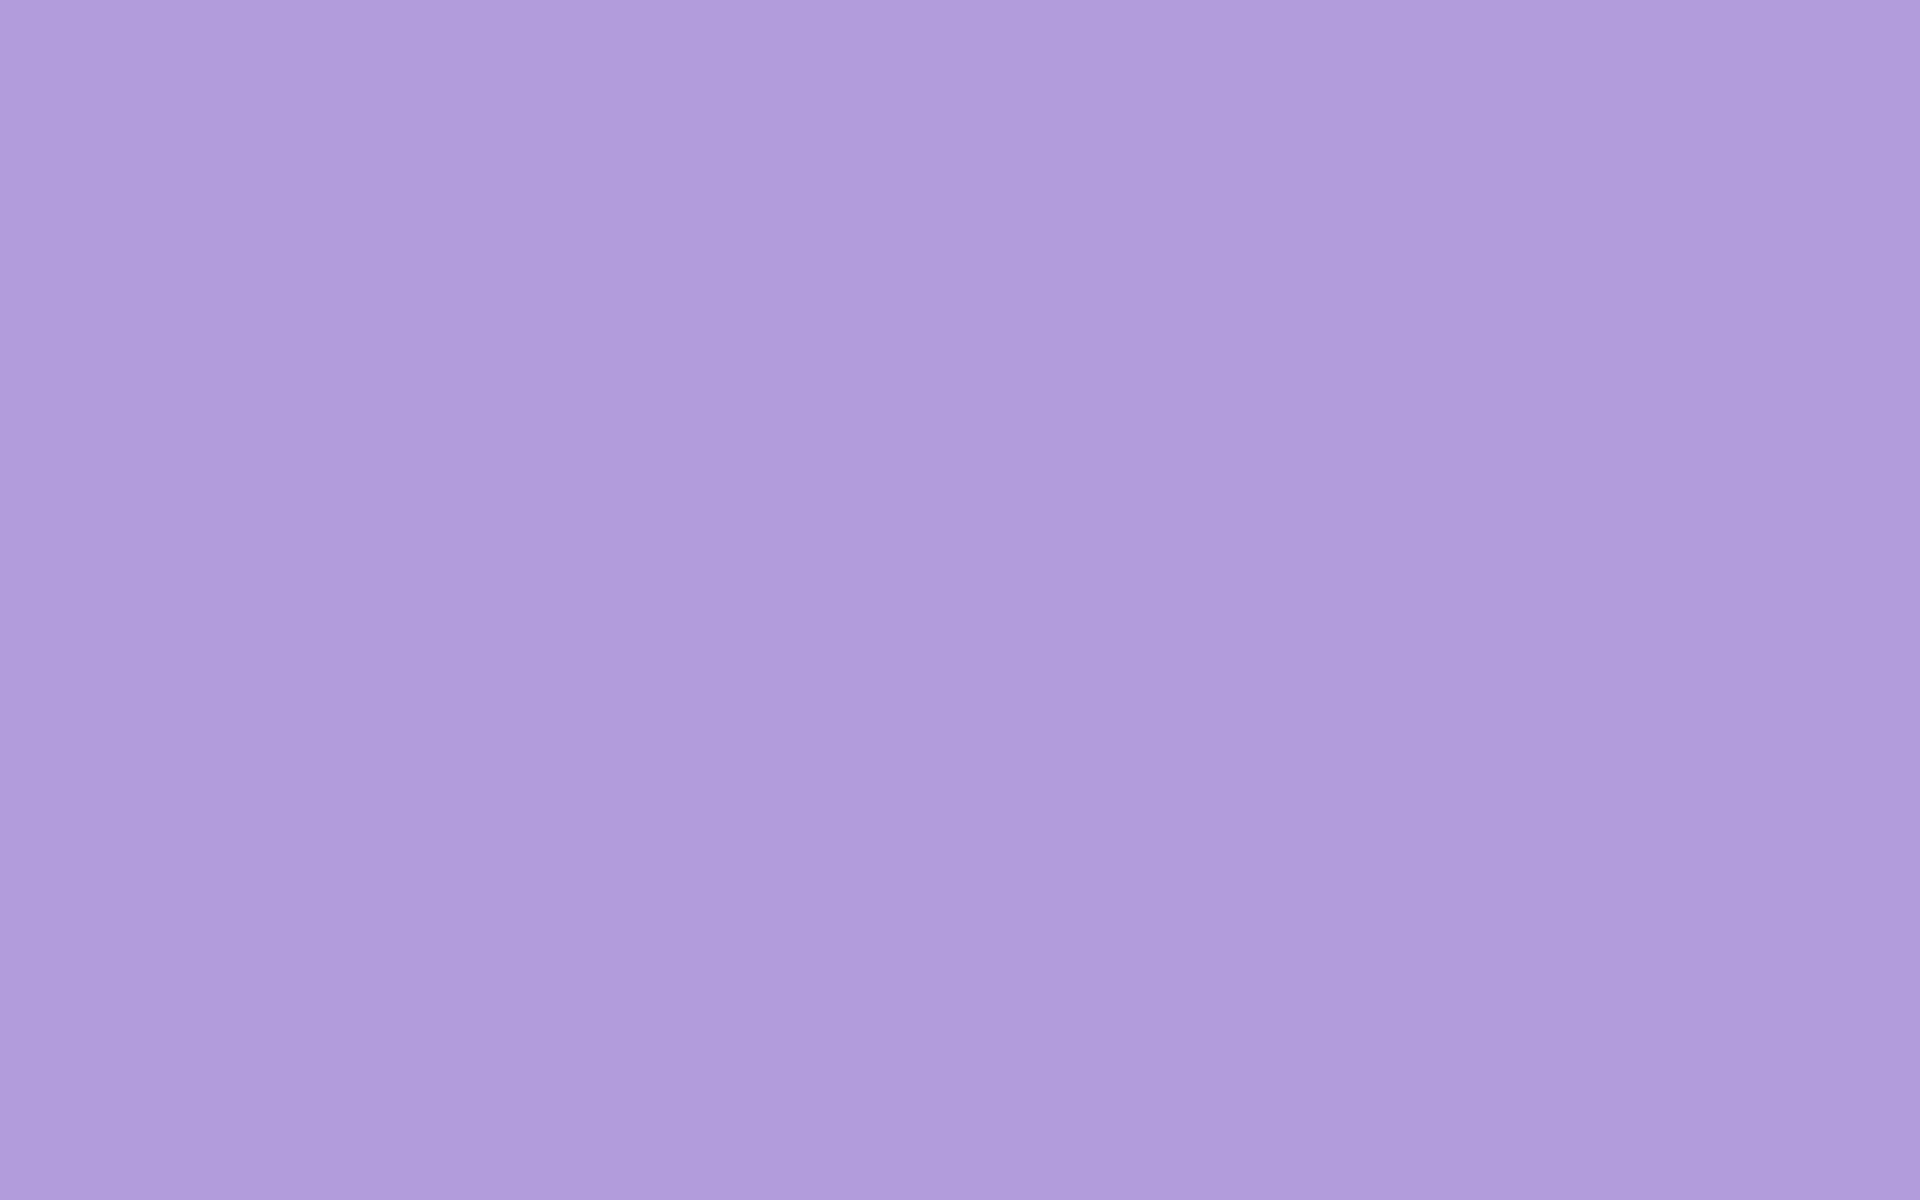 1920x1200 Light Pastel Purple Solid Color Background